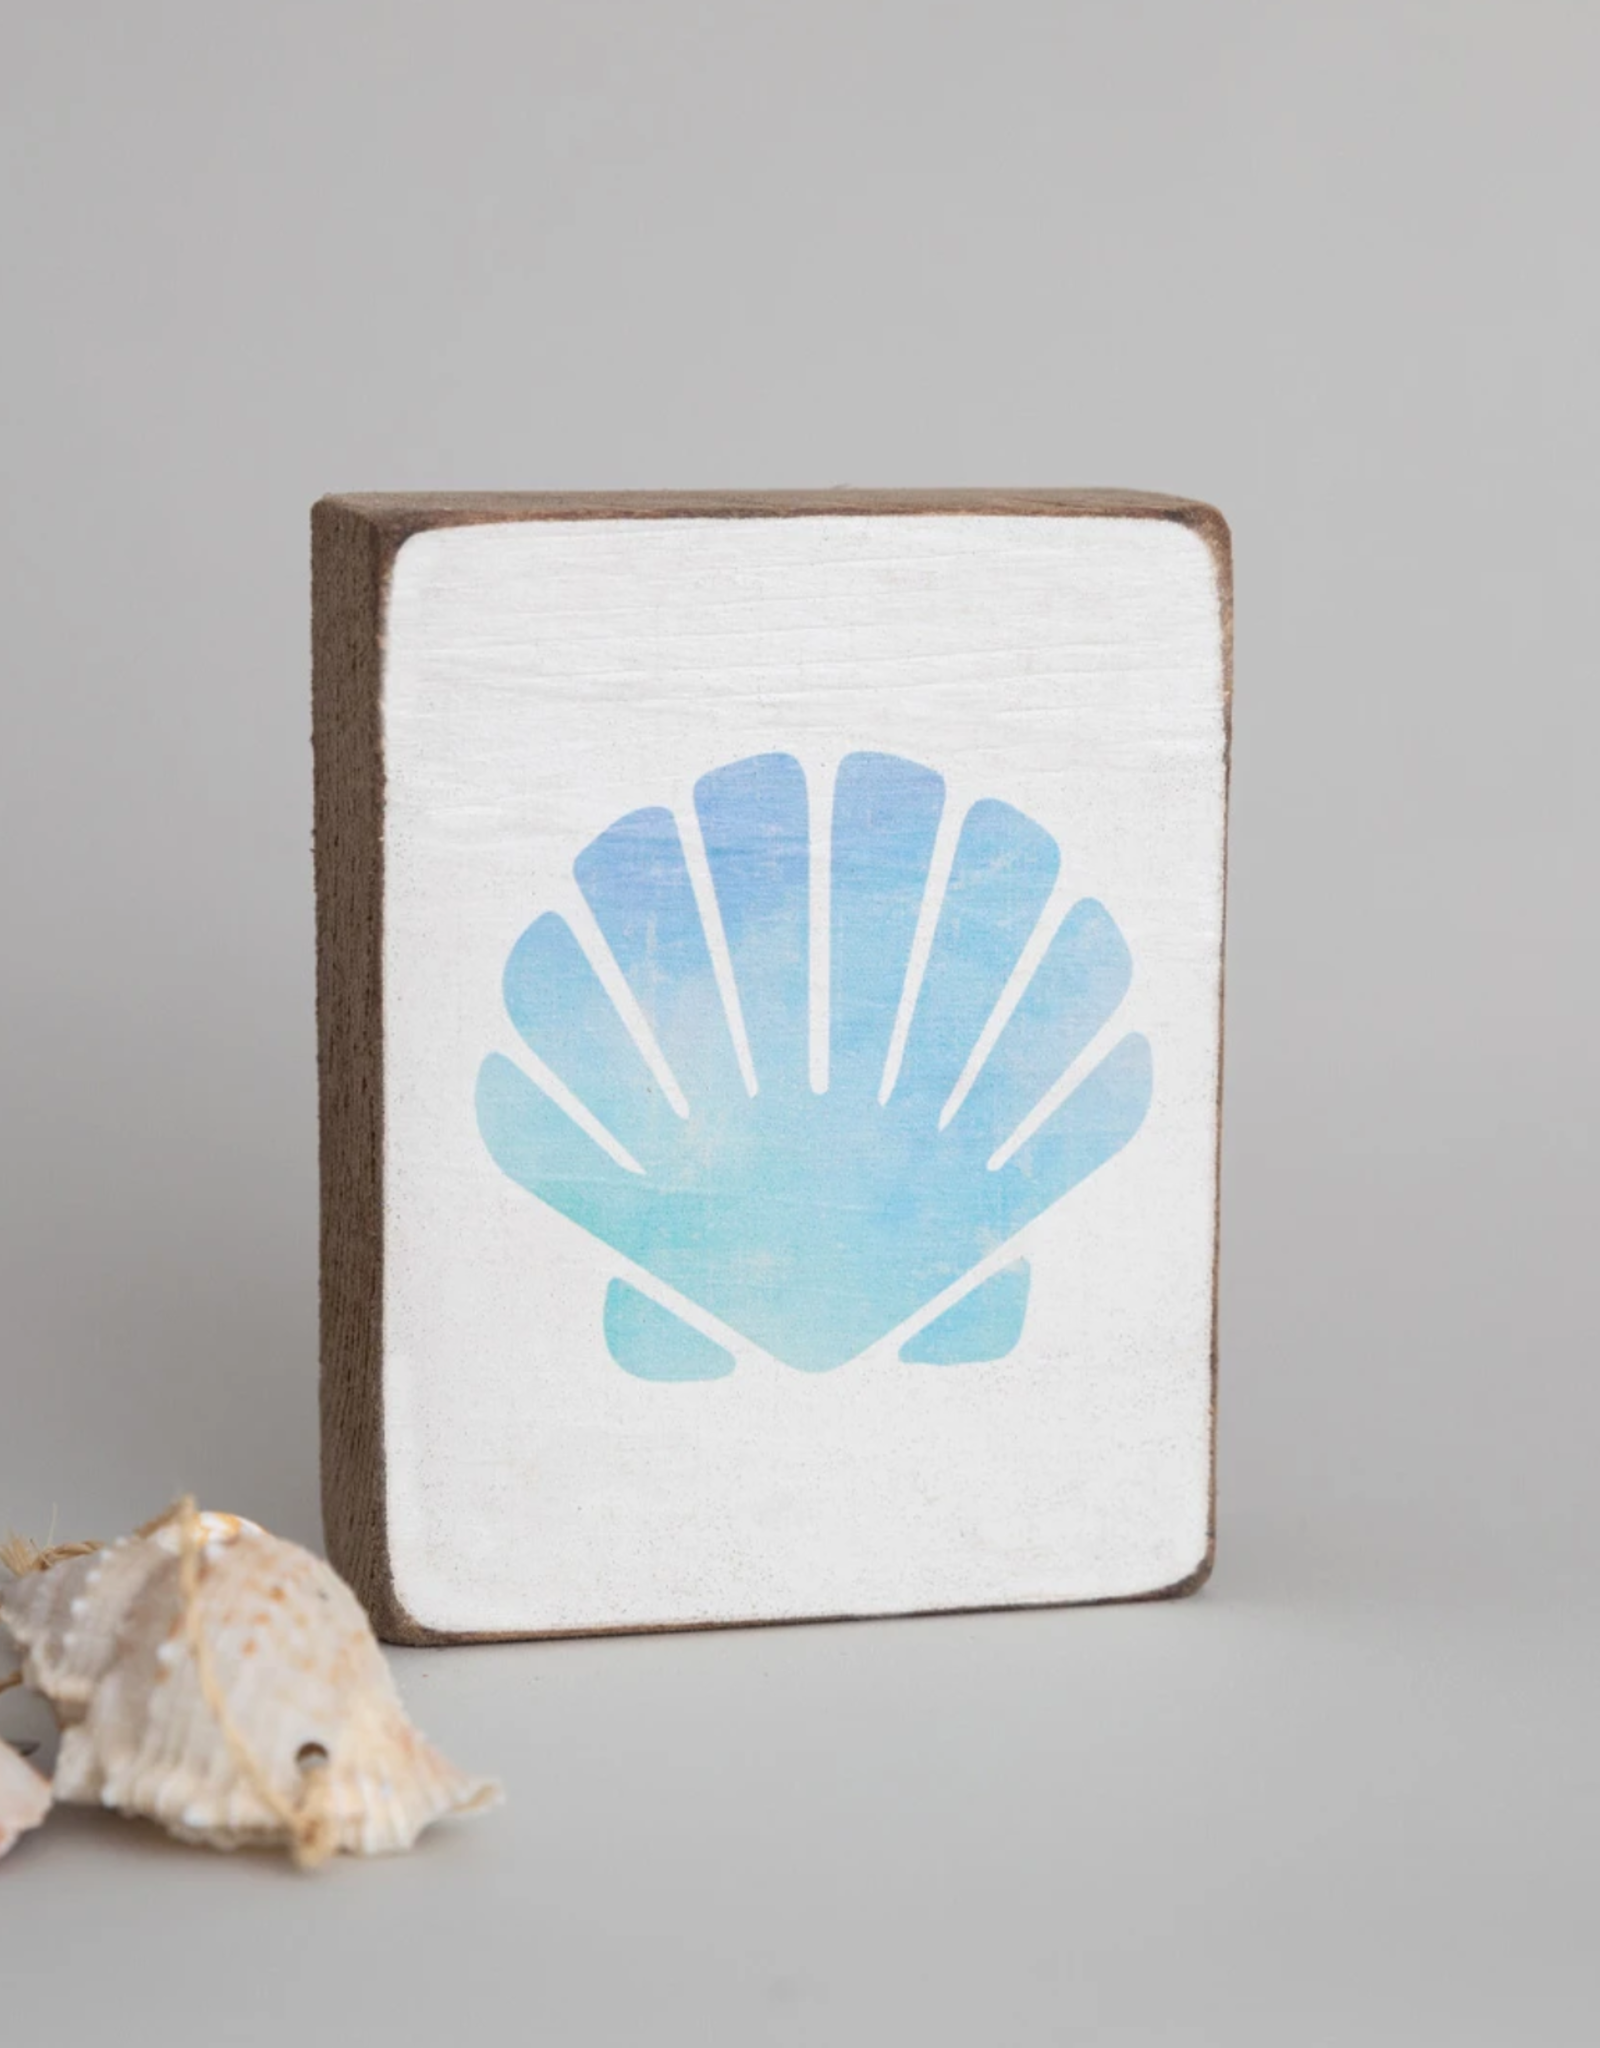 Rustic Marlin Rustic Marlin - Sea Shell Symbol Block